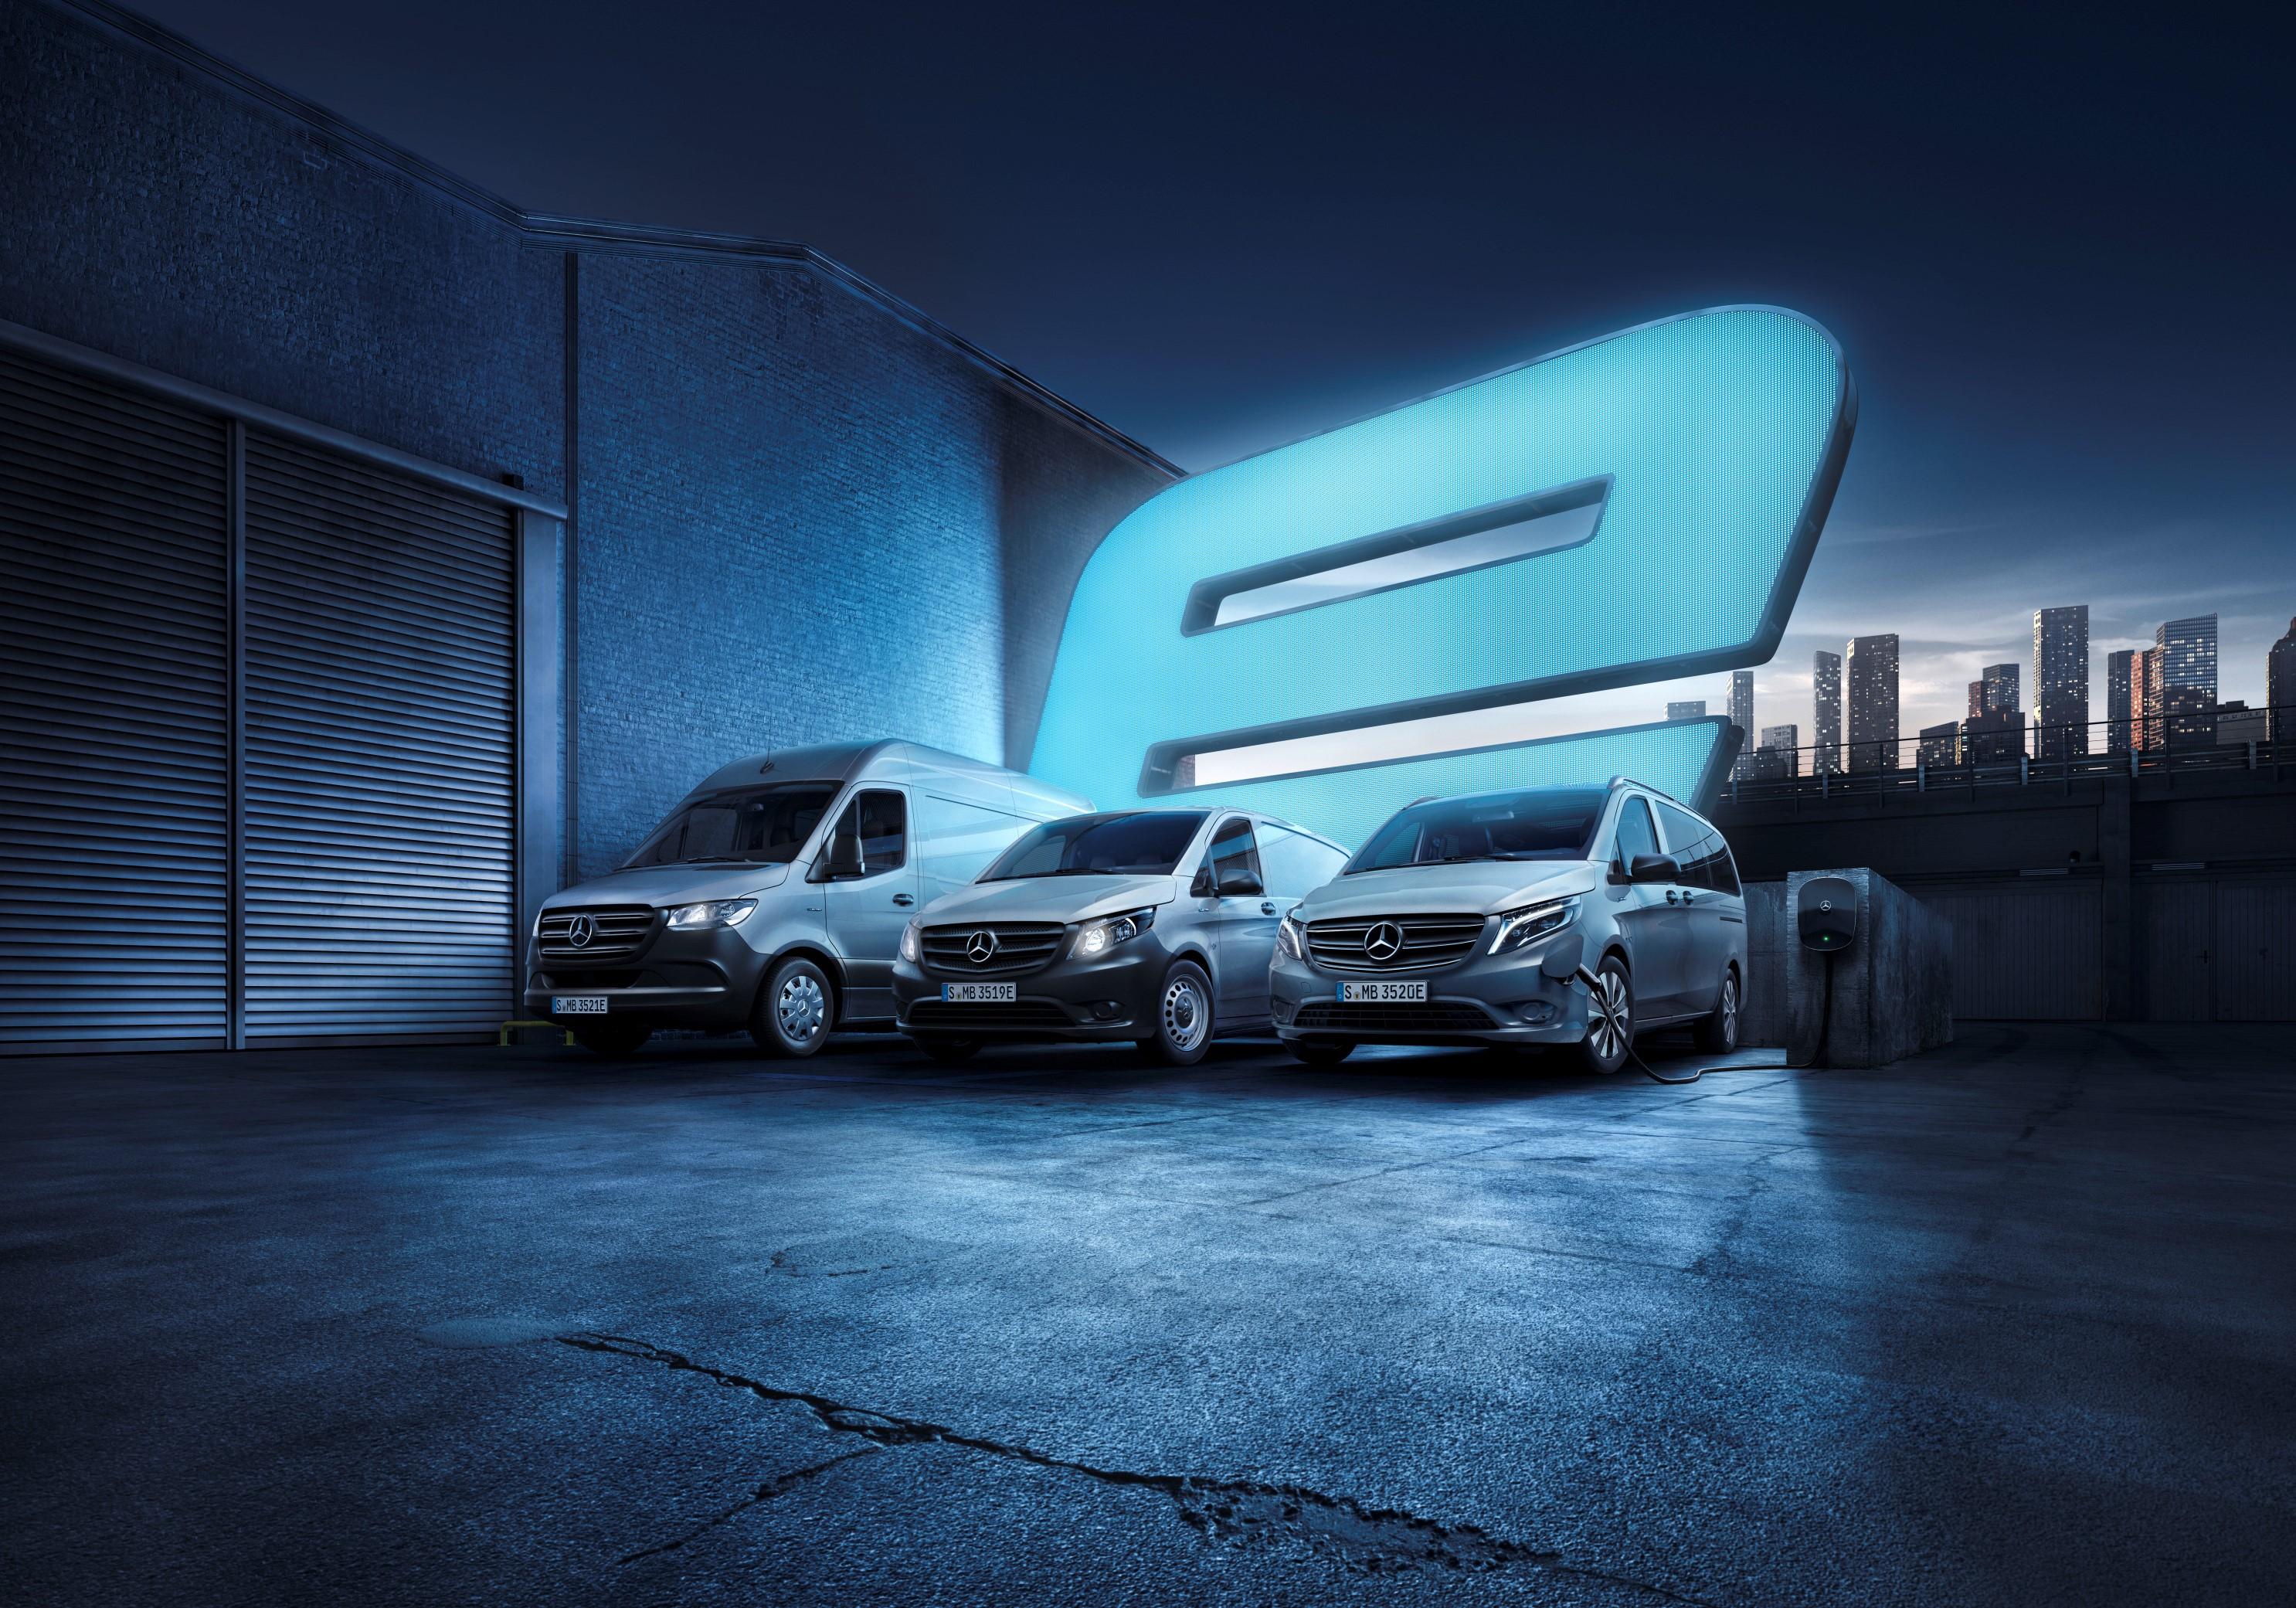 Mercedes-Benz Offers Insurance Geared Toward Electric Vans